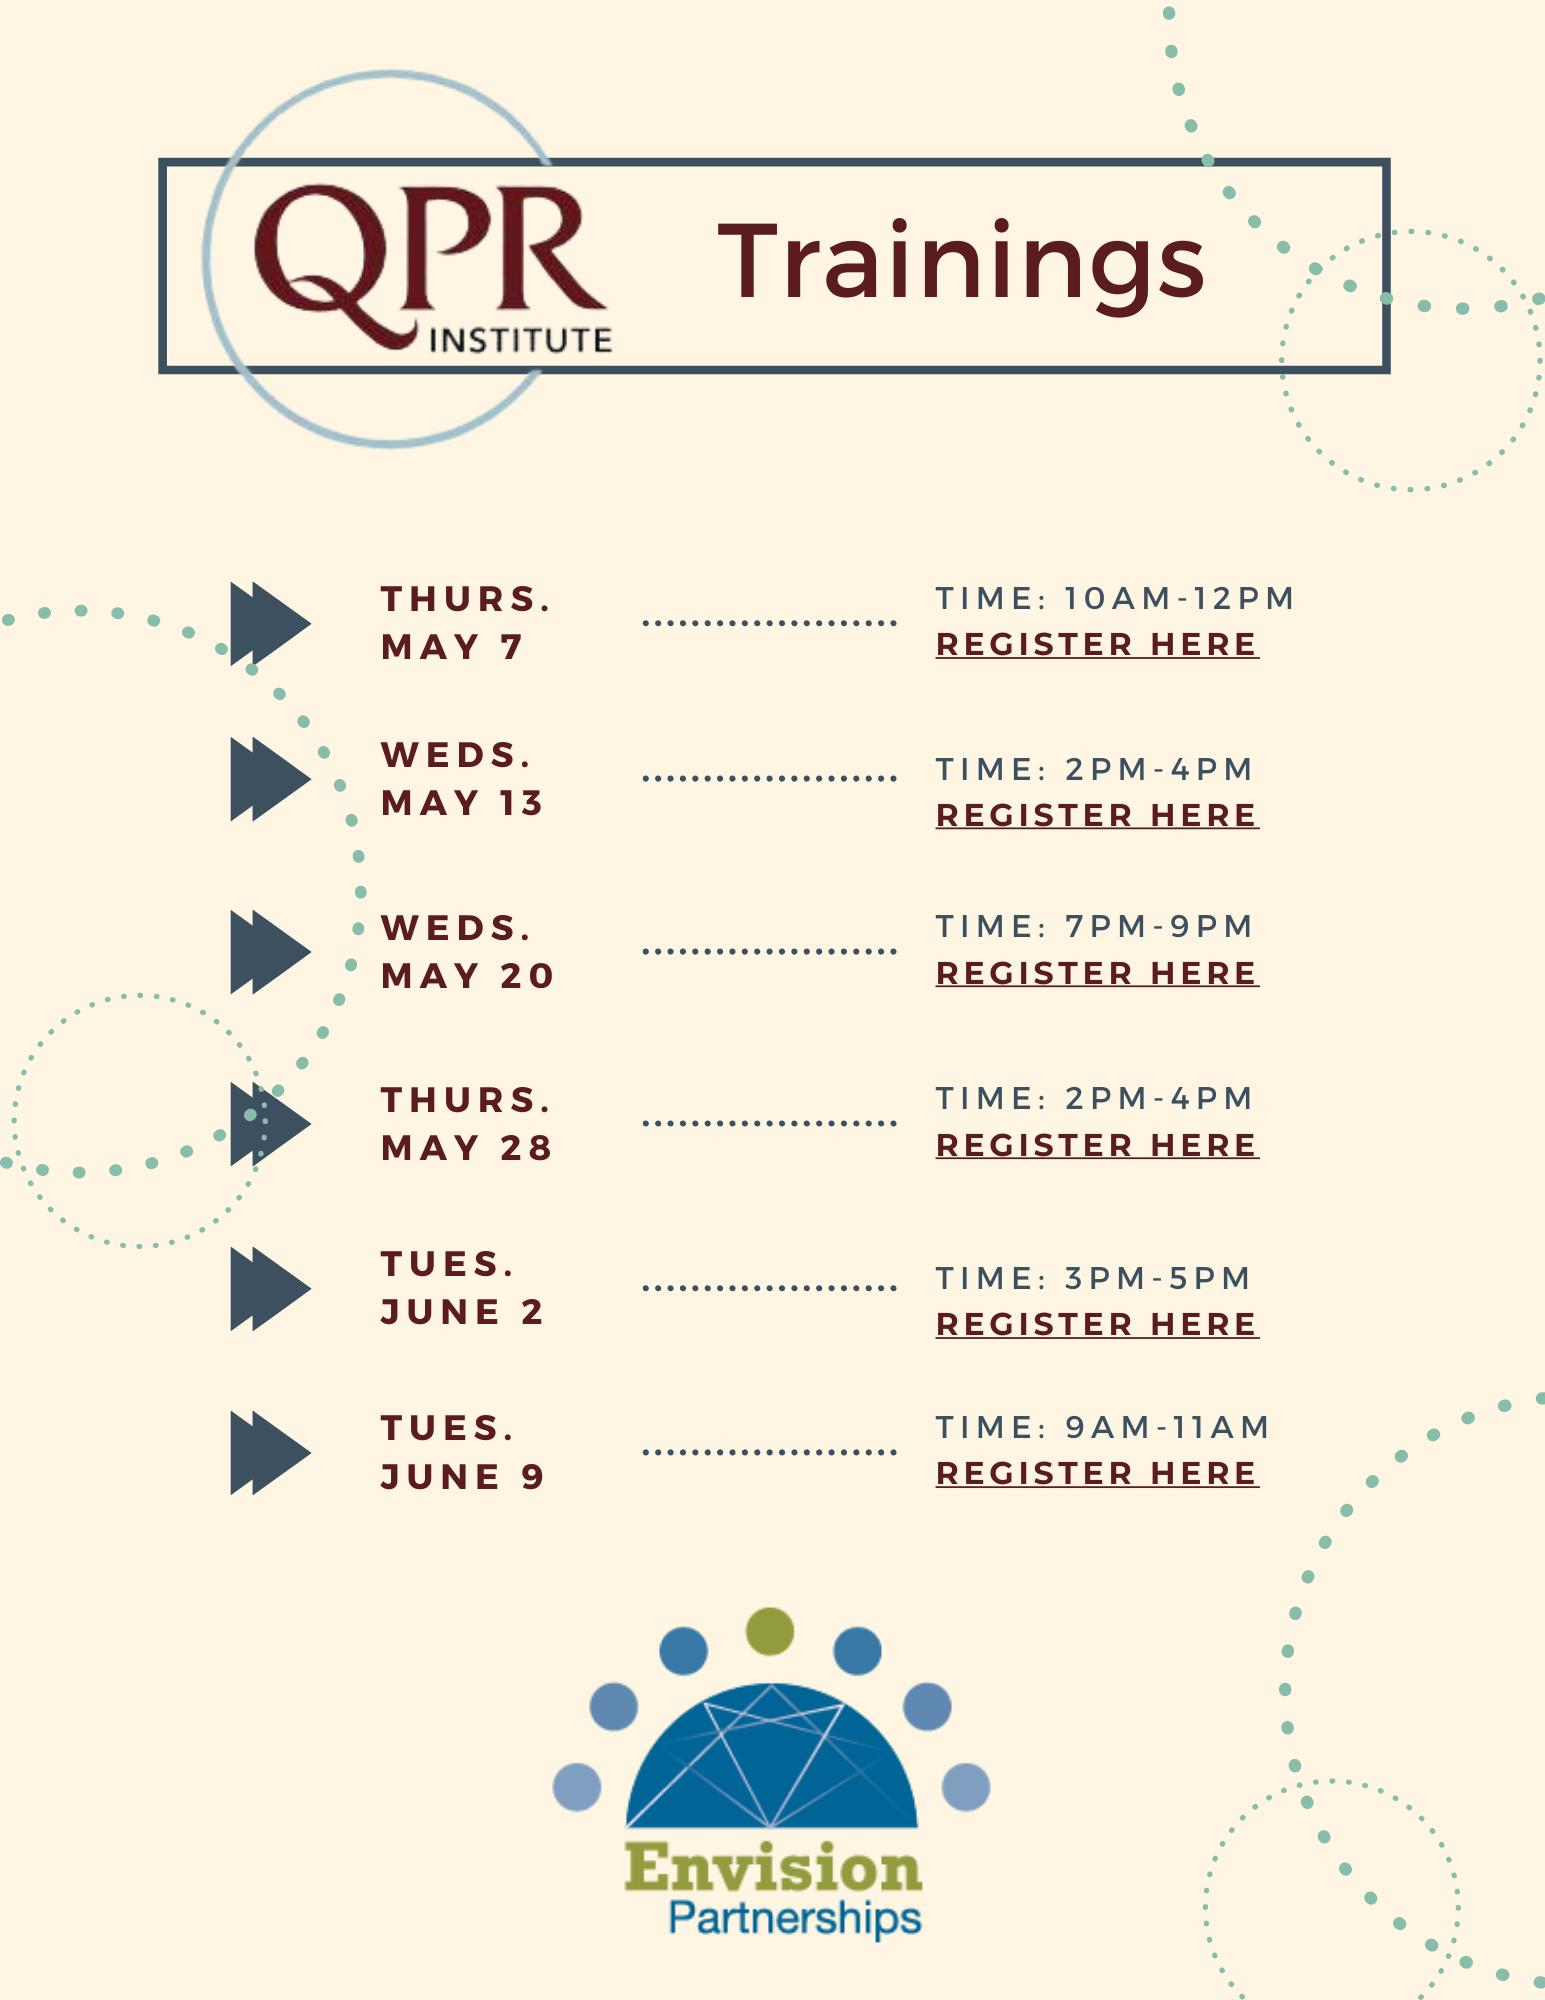 QPR Gatekeeper Training